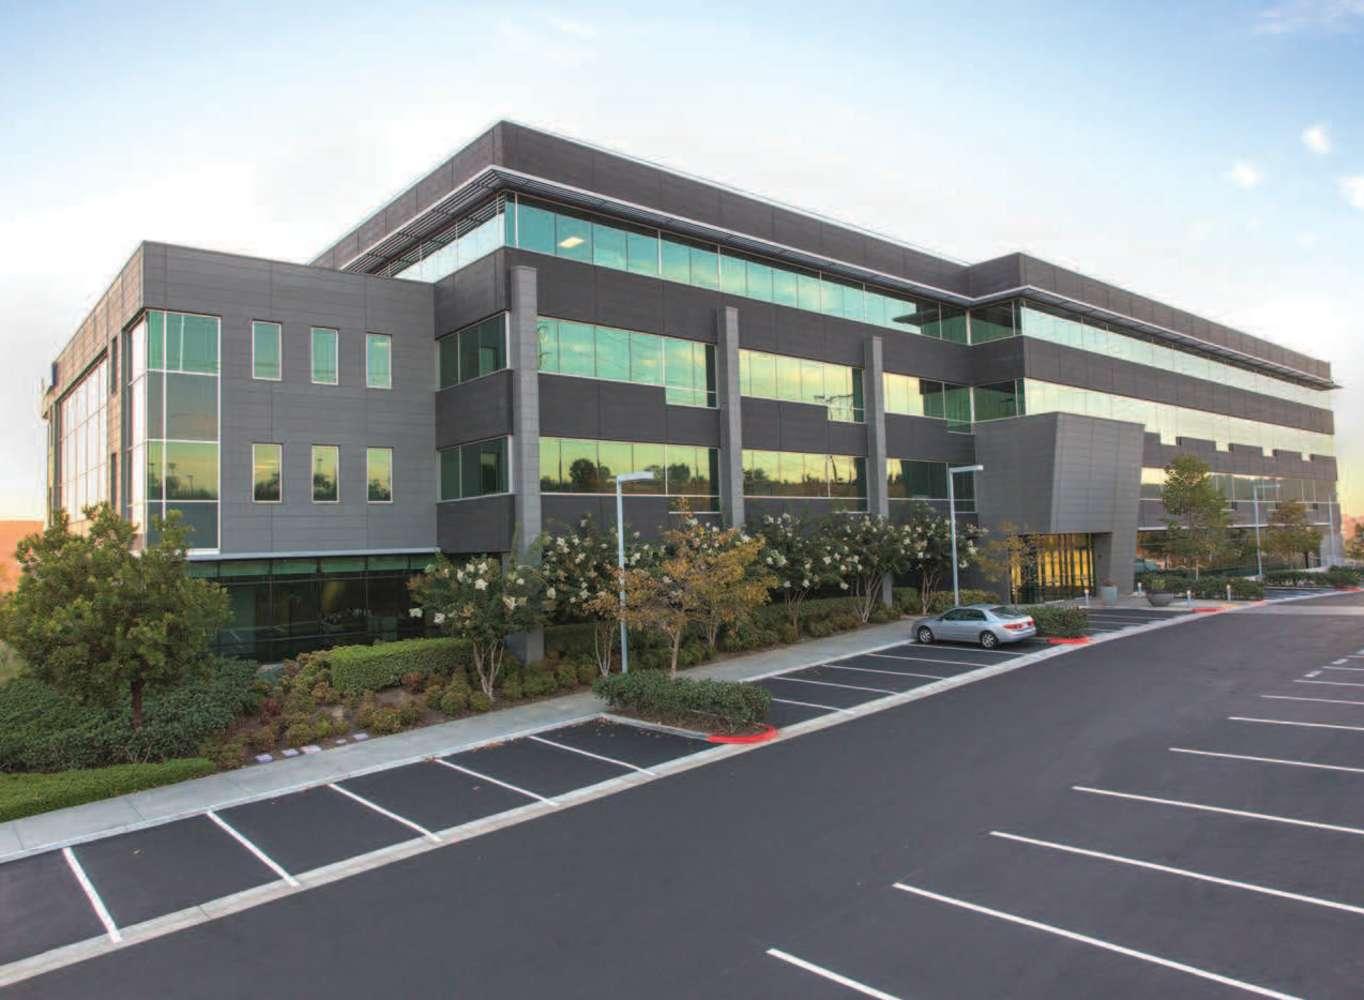 Office San diego, 92131 - The Plaza at Scripps Northridge